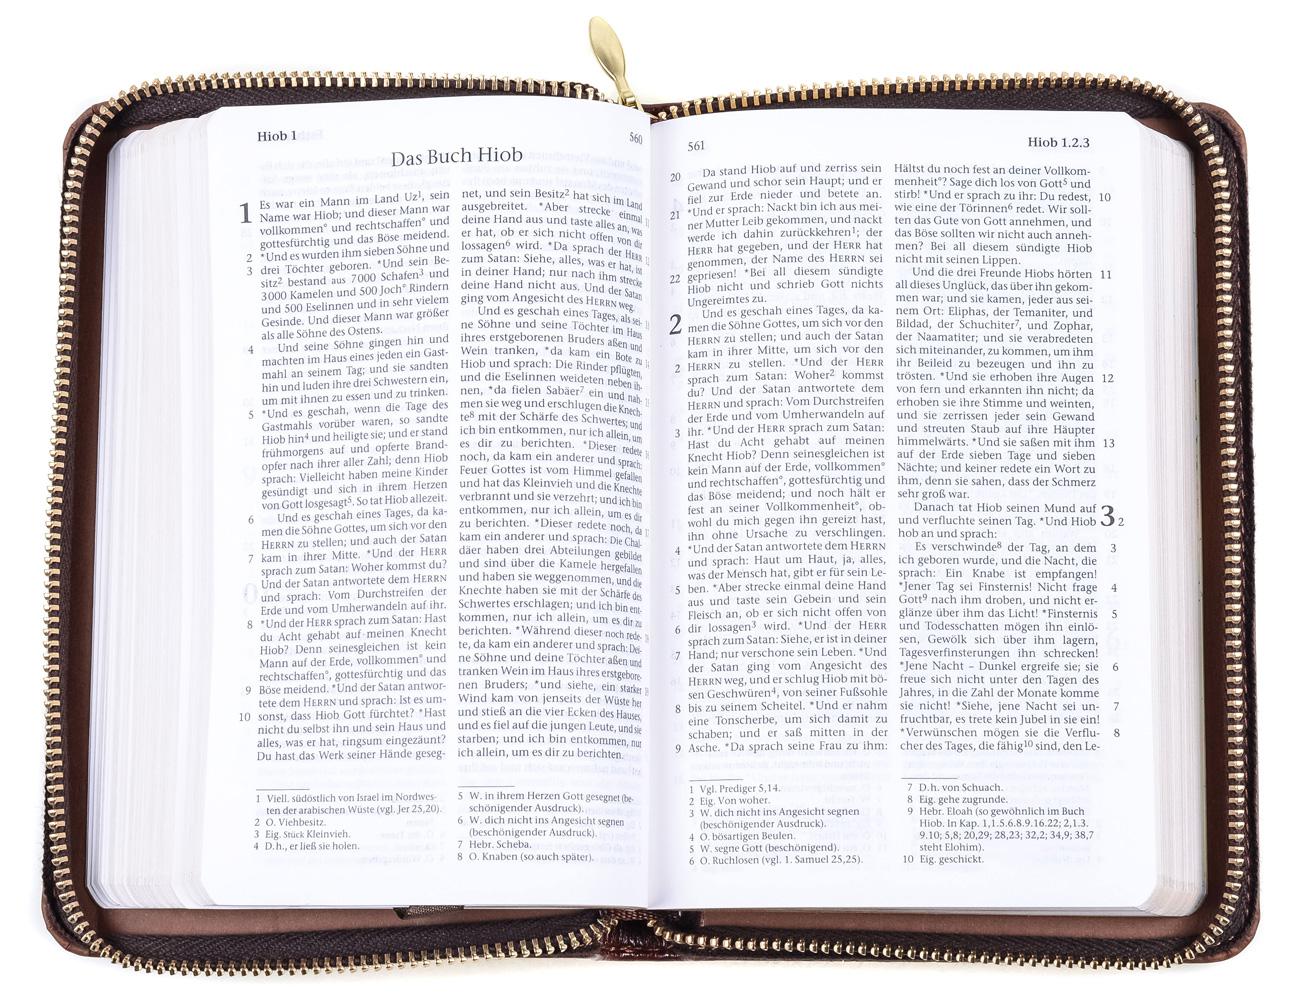 CLV_elberfelder-bibel-pocketbibel-braun-kunstleder-mit-reissverschluss_256046_3